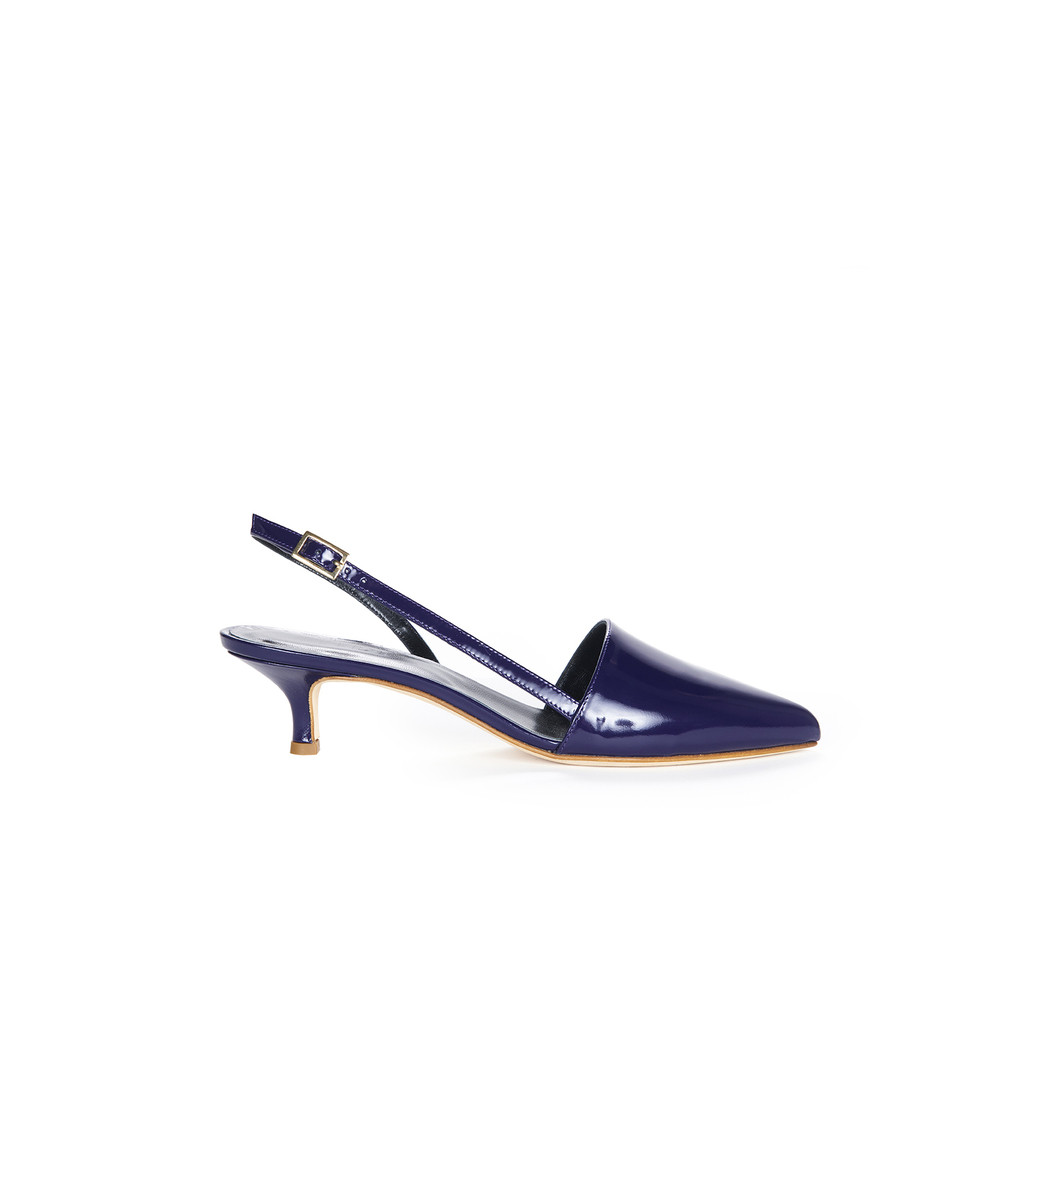 a77c513b78b Tibi Simon Heels - Violet Polished Calf Heels